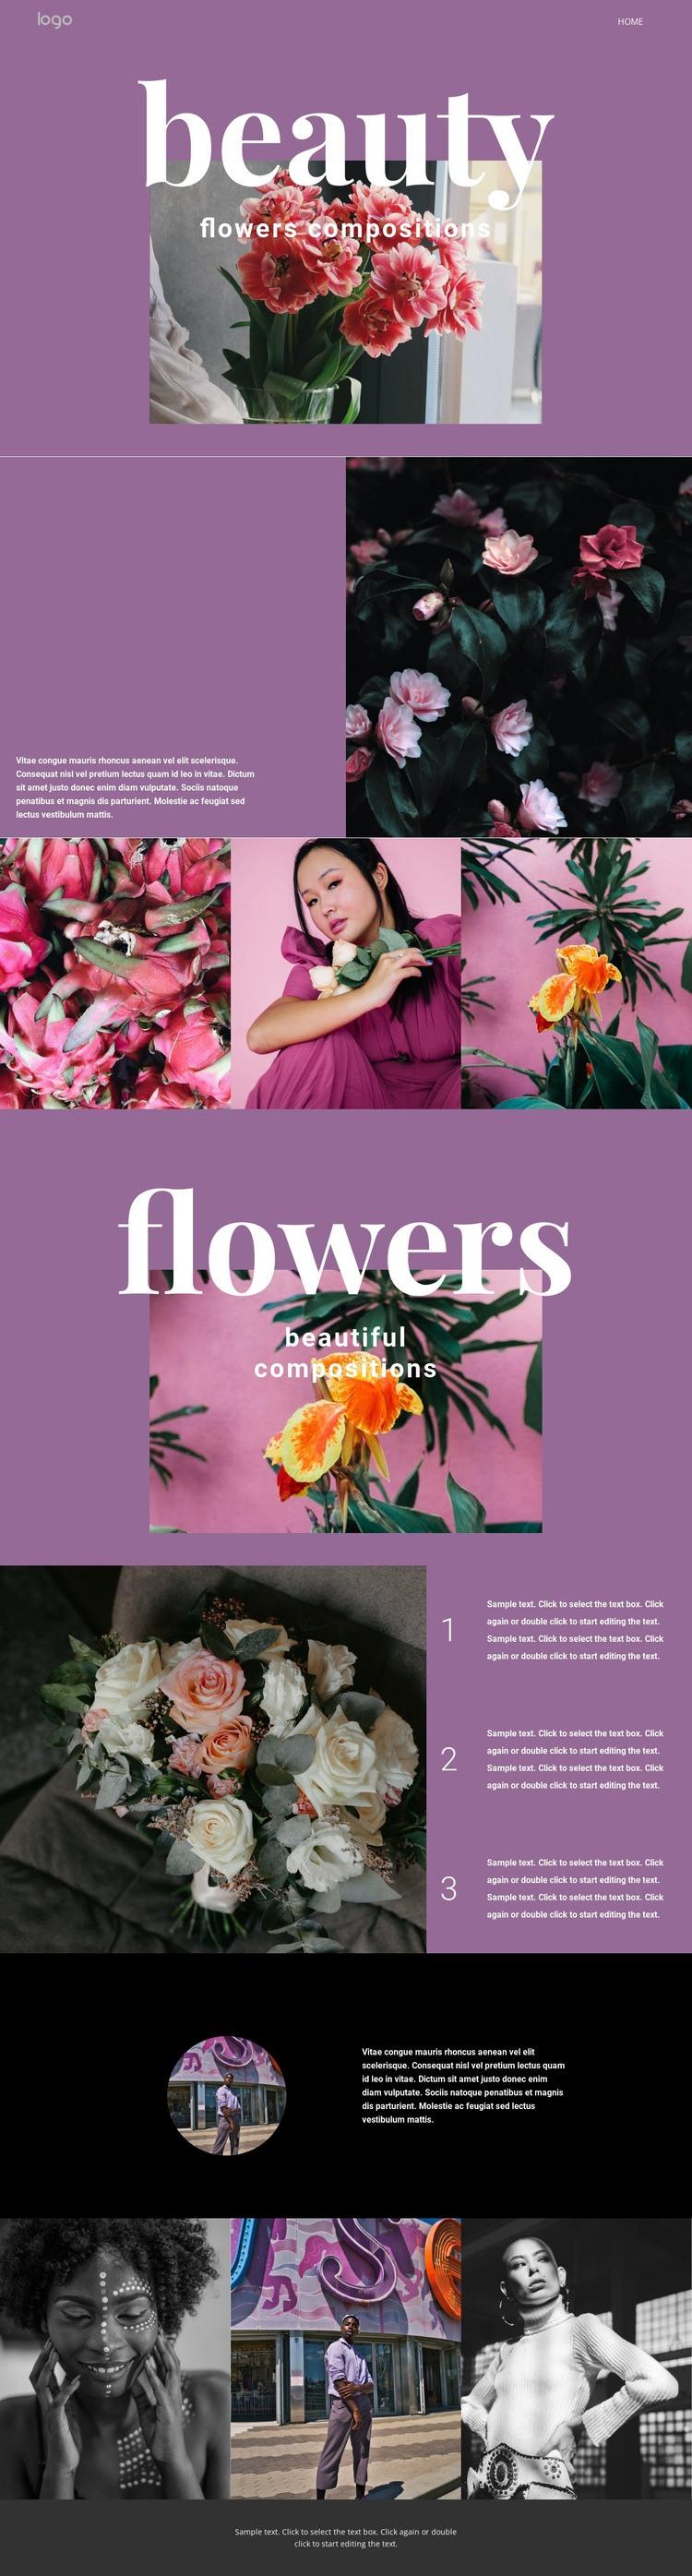 Flower salon Html Code Example